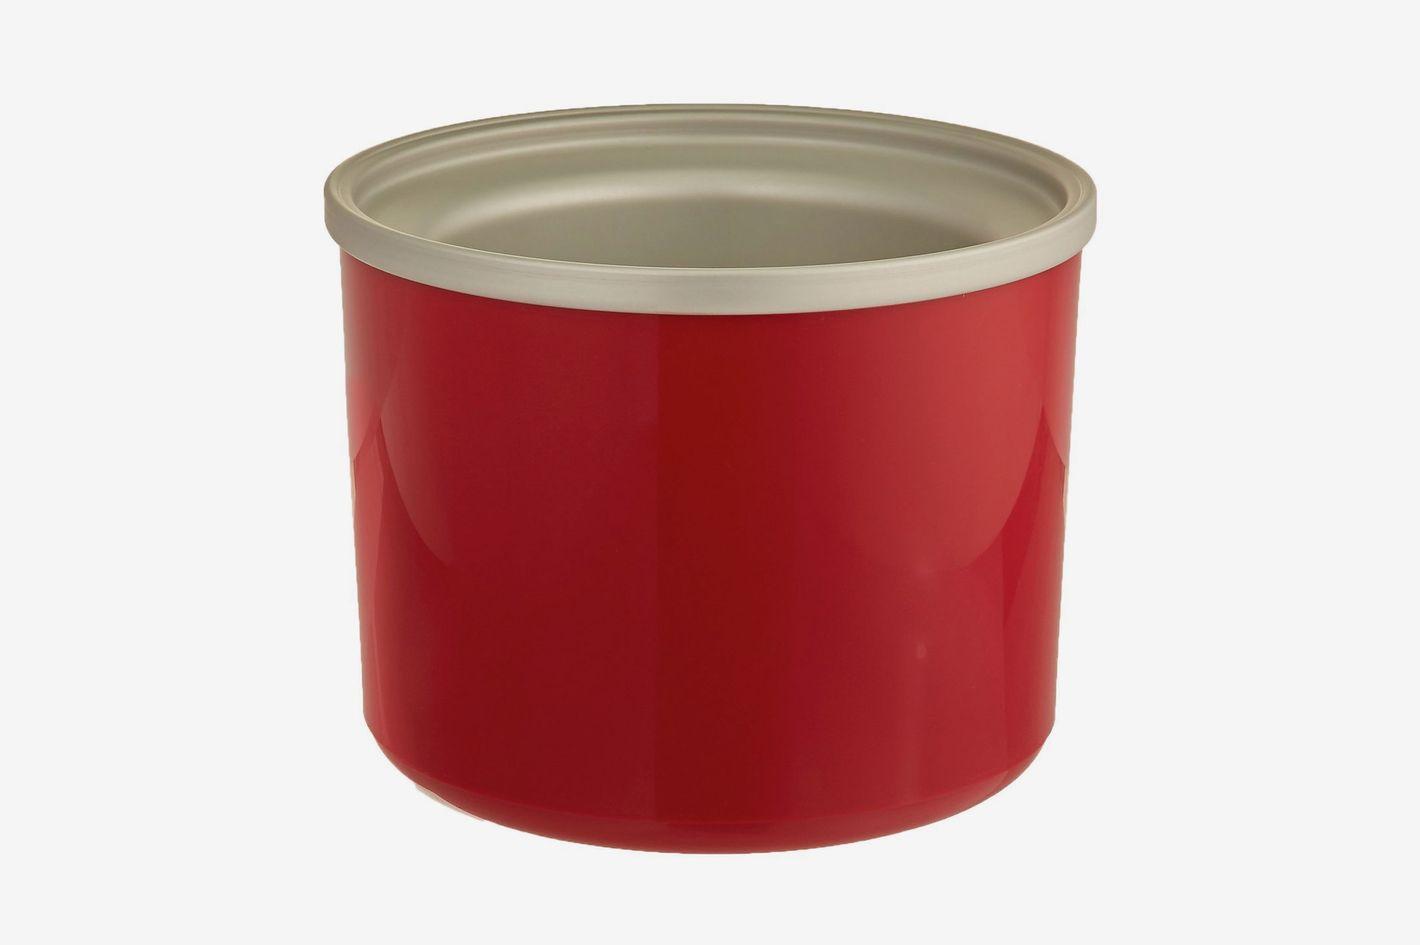 Cuisinart ICE-RFBR Replacement Freezer Bowl, 1-1/2-Quart Capacity, Red